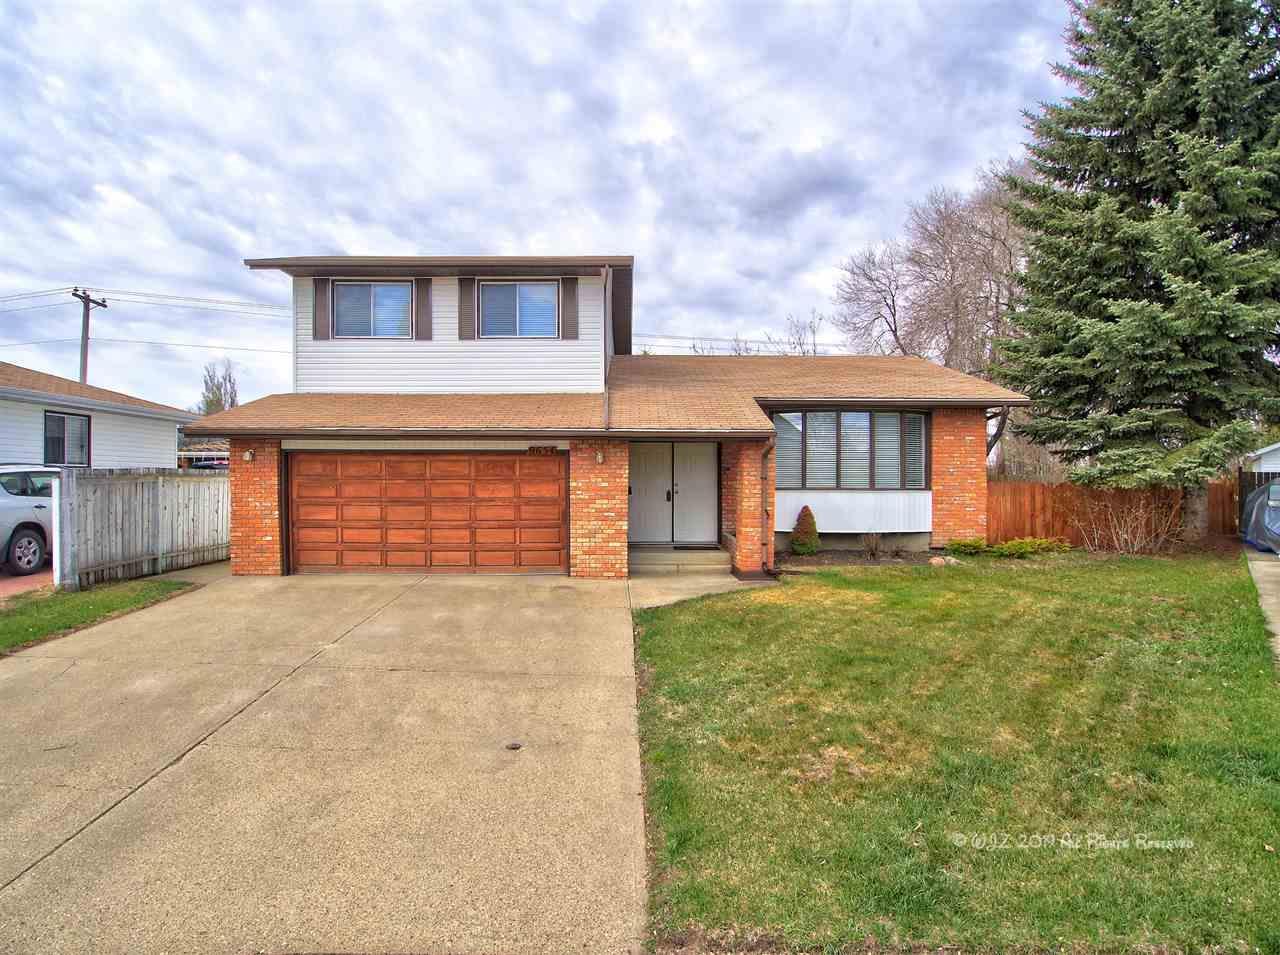 Removed: 9654 79 Street, Fort Saskatchewan, AB - Removed on 2019-05-24 23:15:17